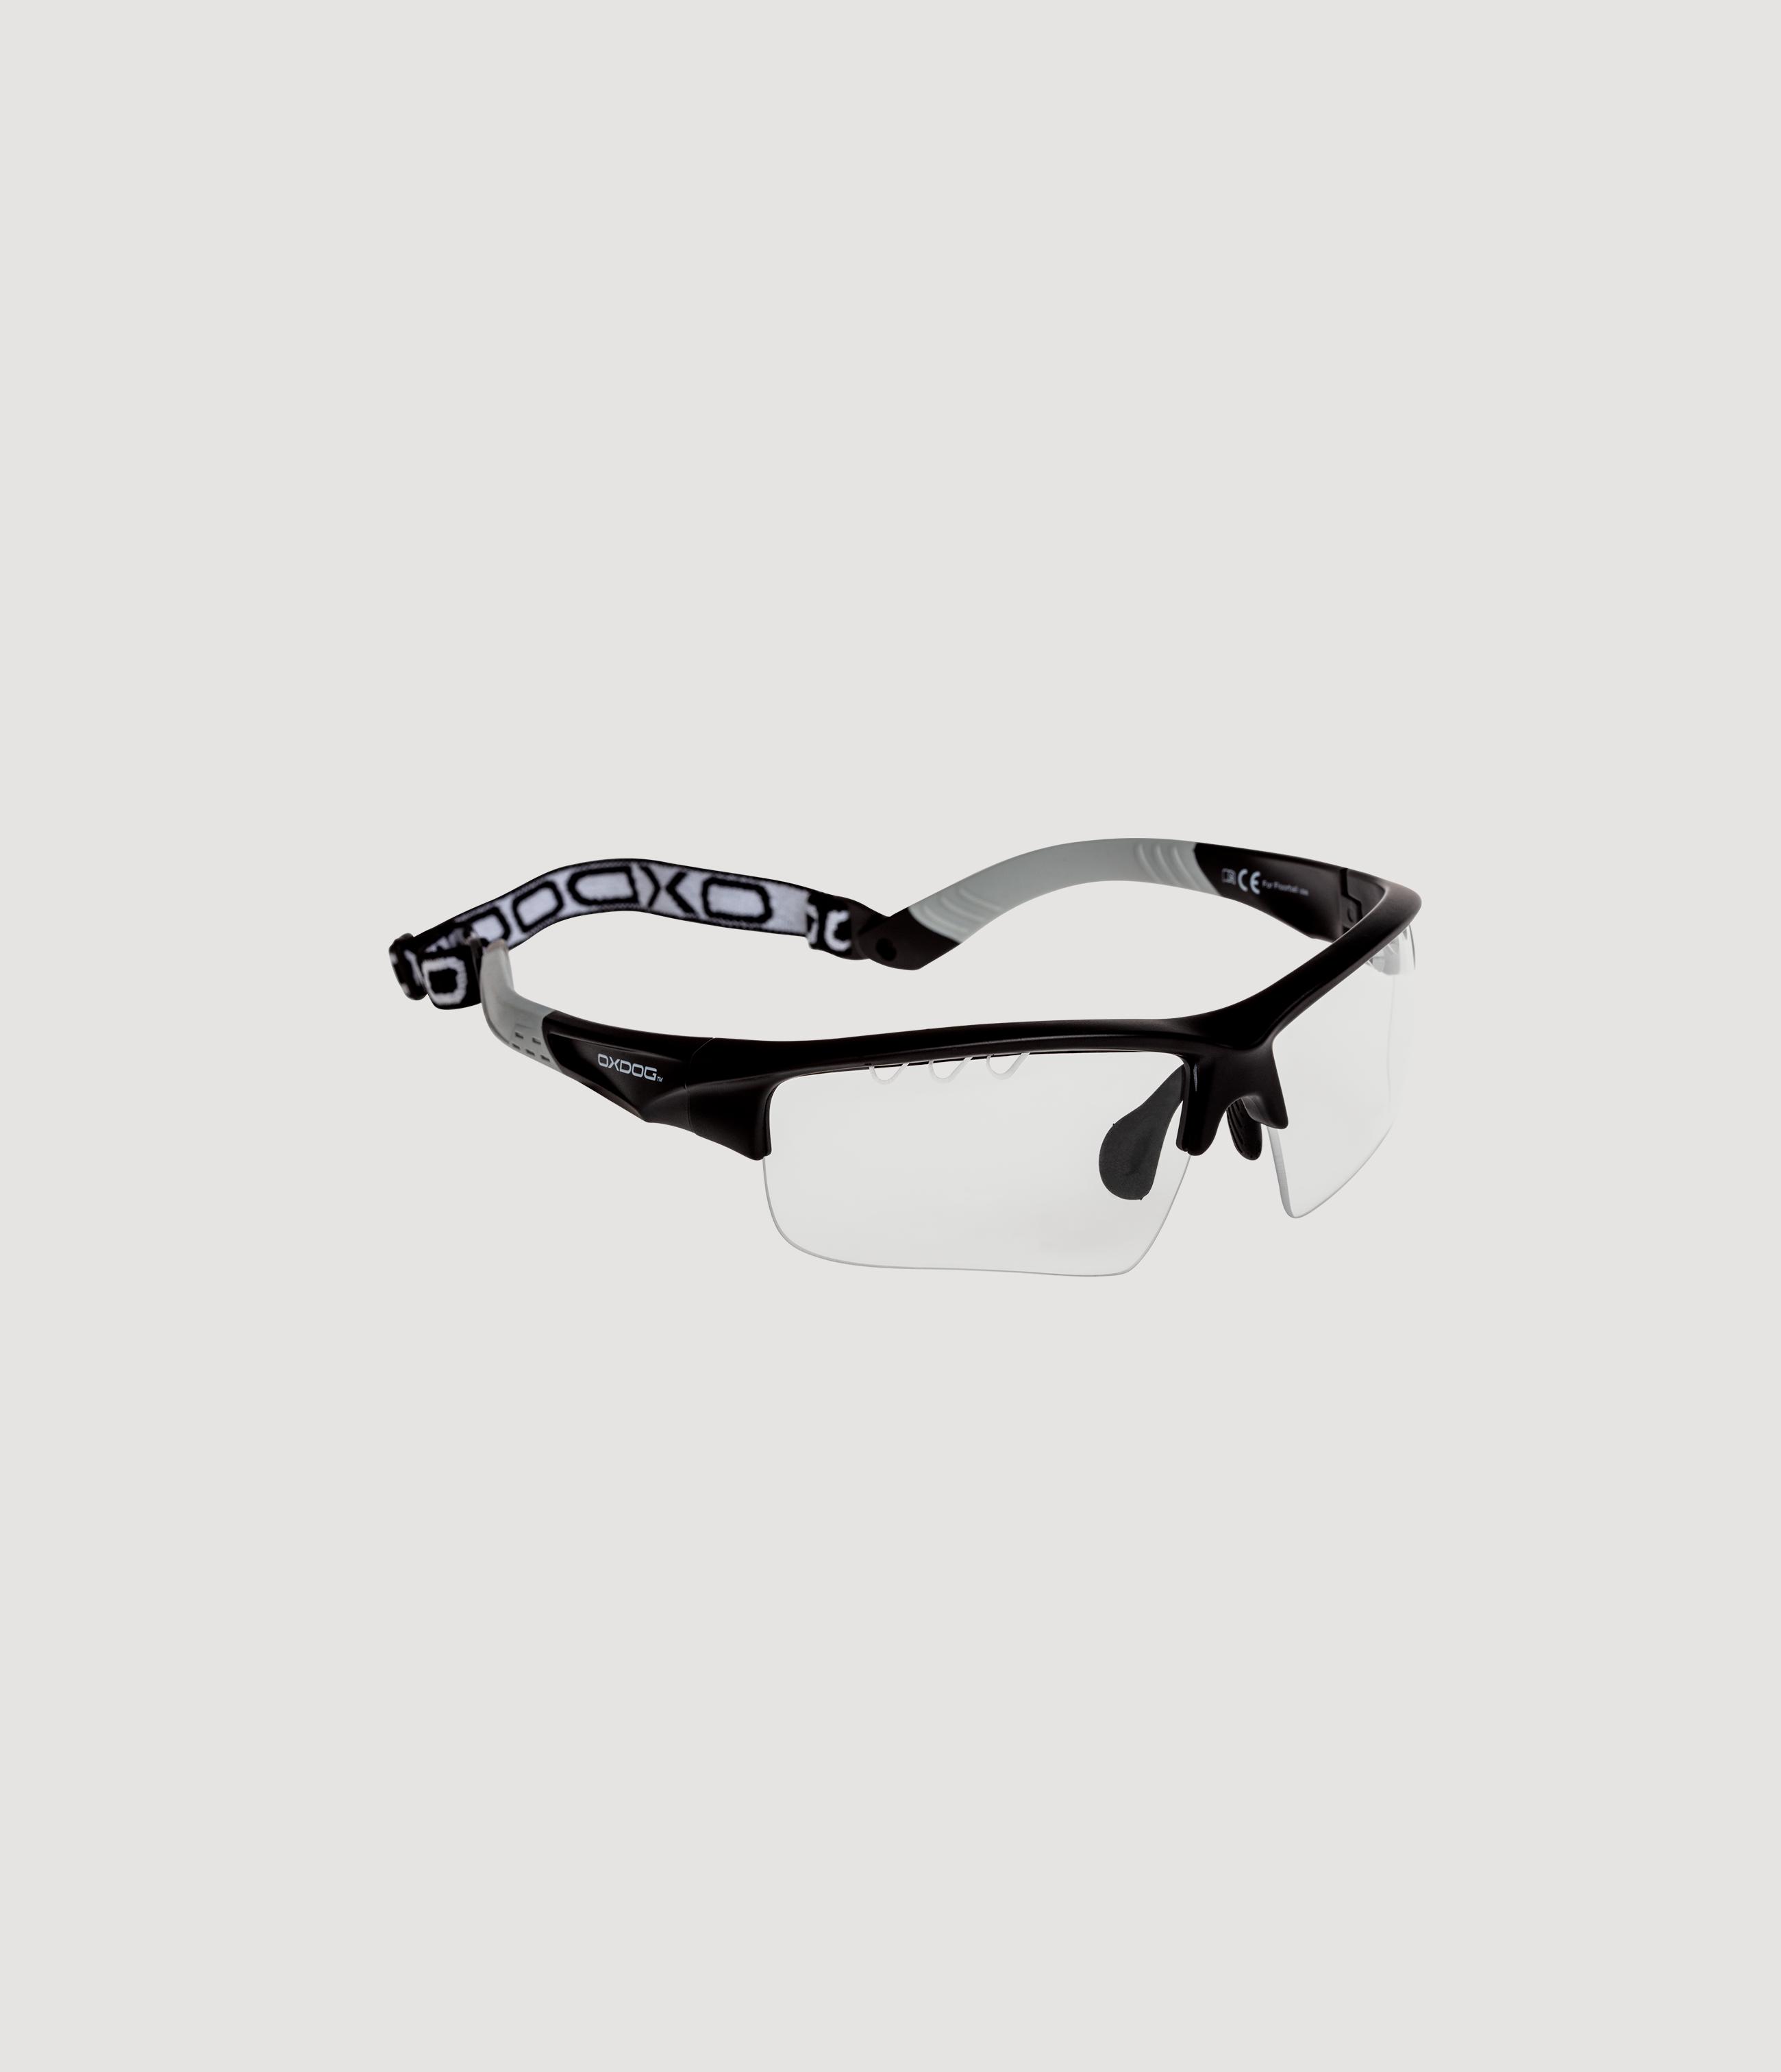 Spectrum Eyewear Black Strap